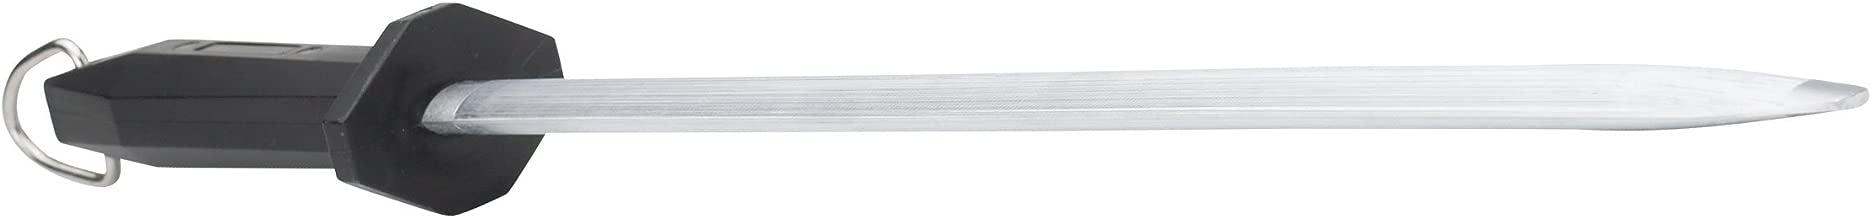 WINCO Premium Oval Sharpening Steel, 14-Inch